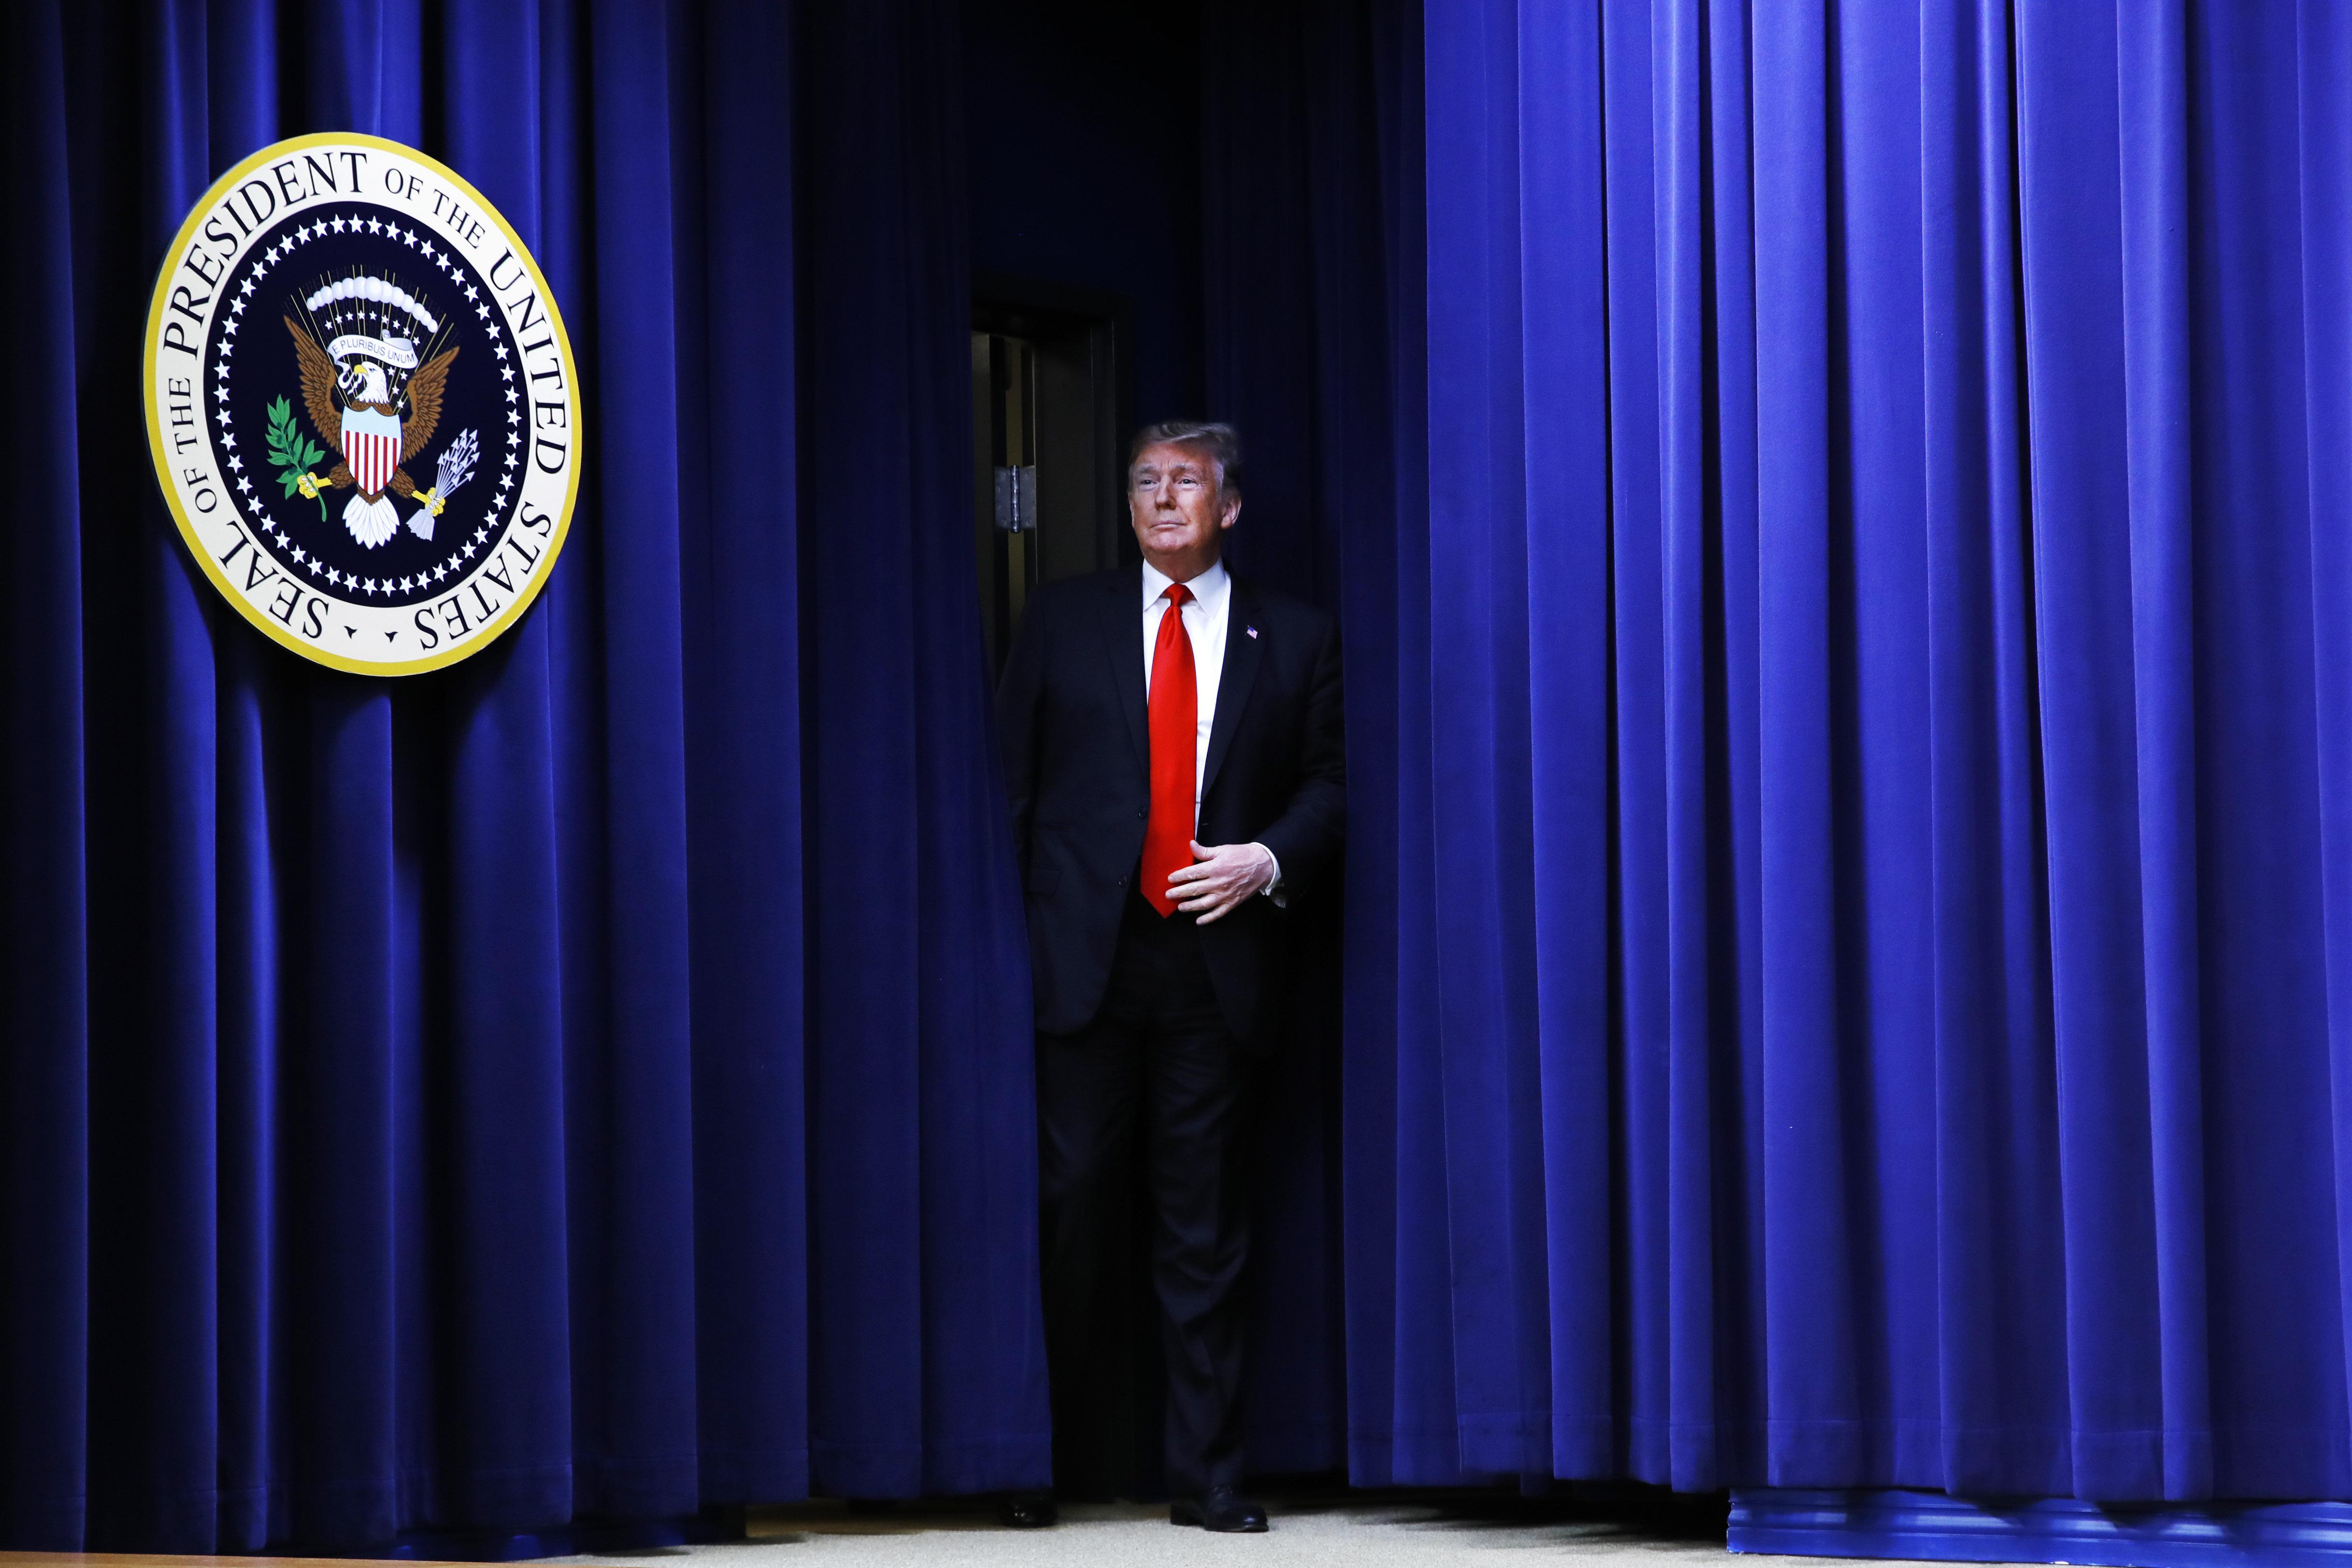 6a24e9b89b3 ... Ή «έξοδος» των ΗΠΑ από τη Συρία: Τα «απόνερα» της απόφασης Τραμπ για  απόσυρση των αμερικανικών δυνάμεων